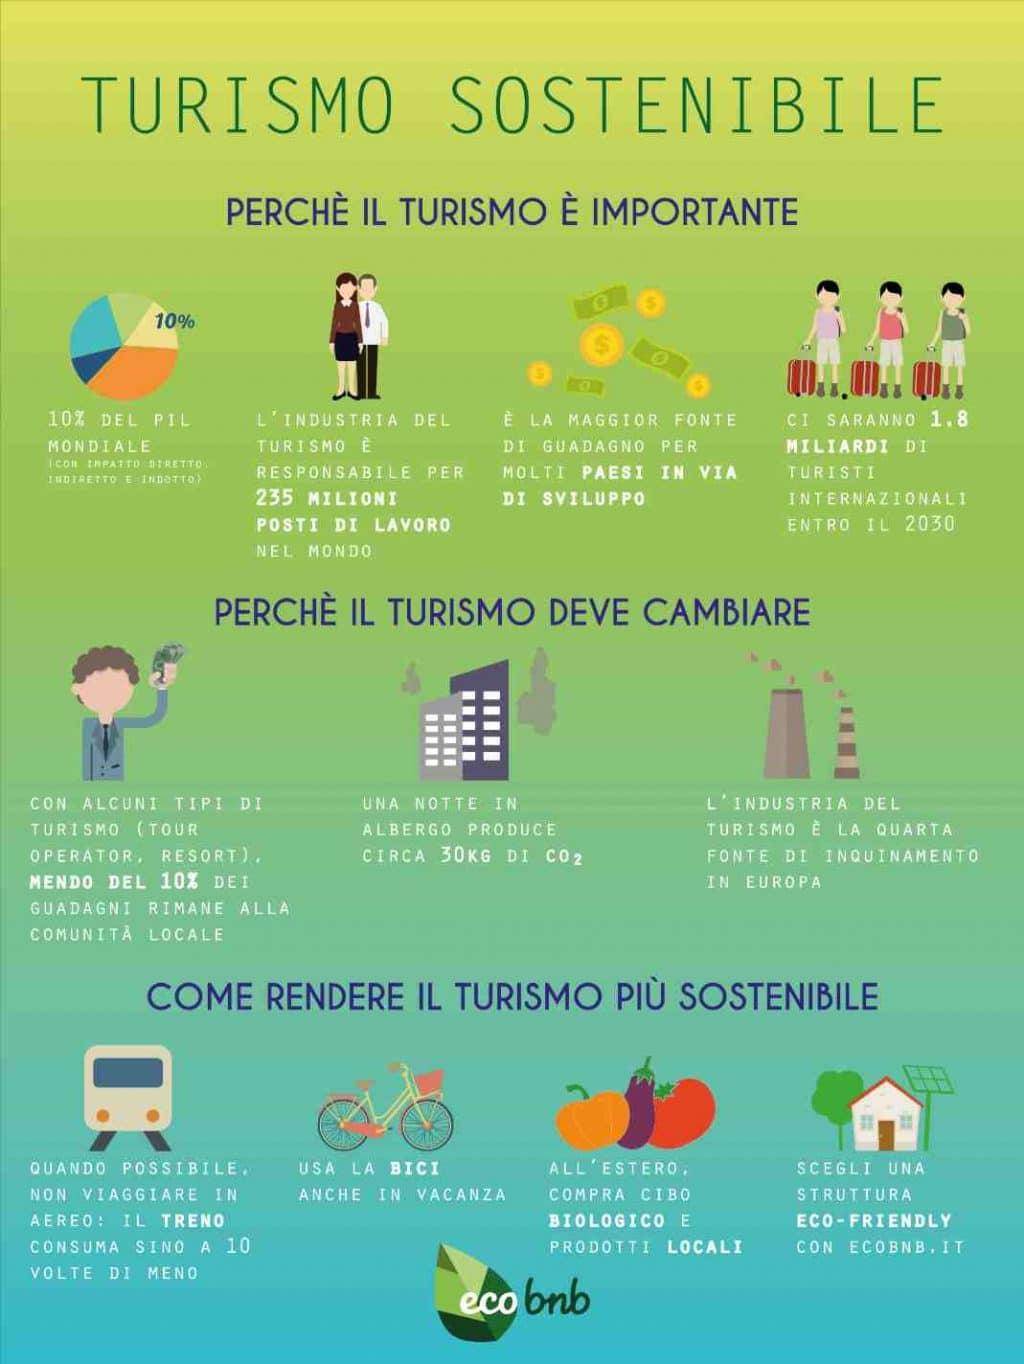 Turismo Sostenibile Italia